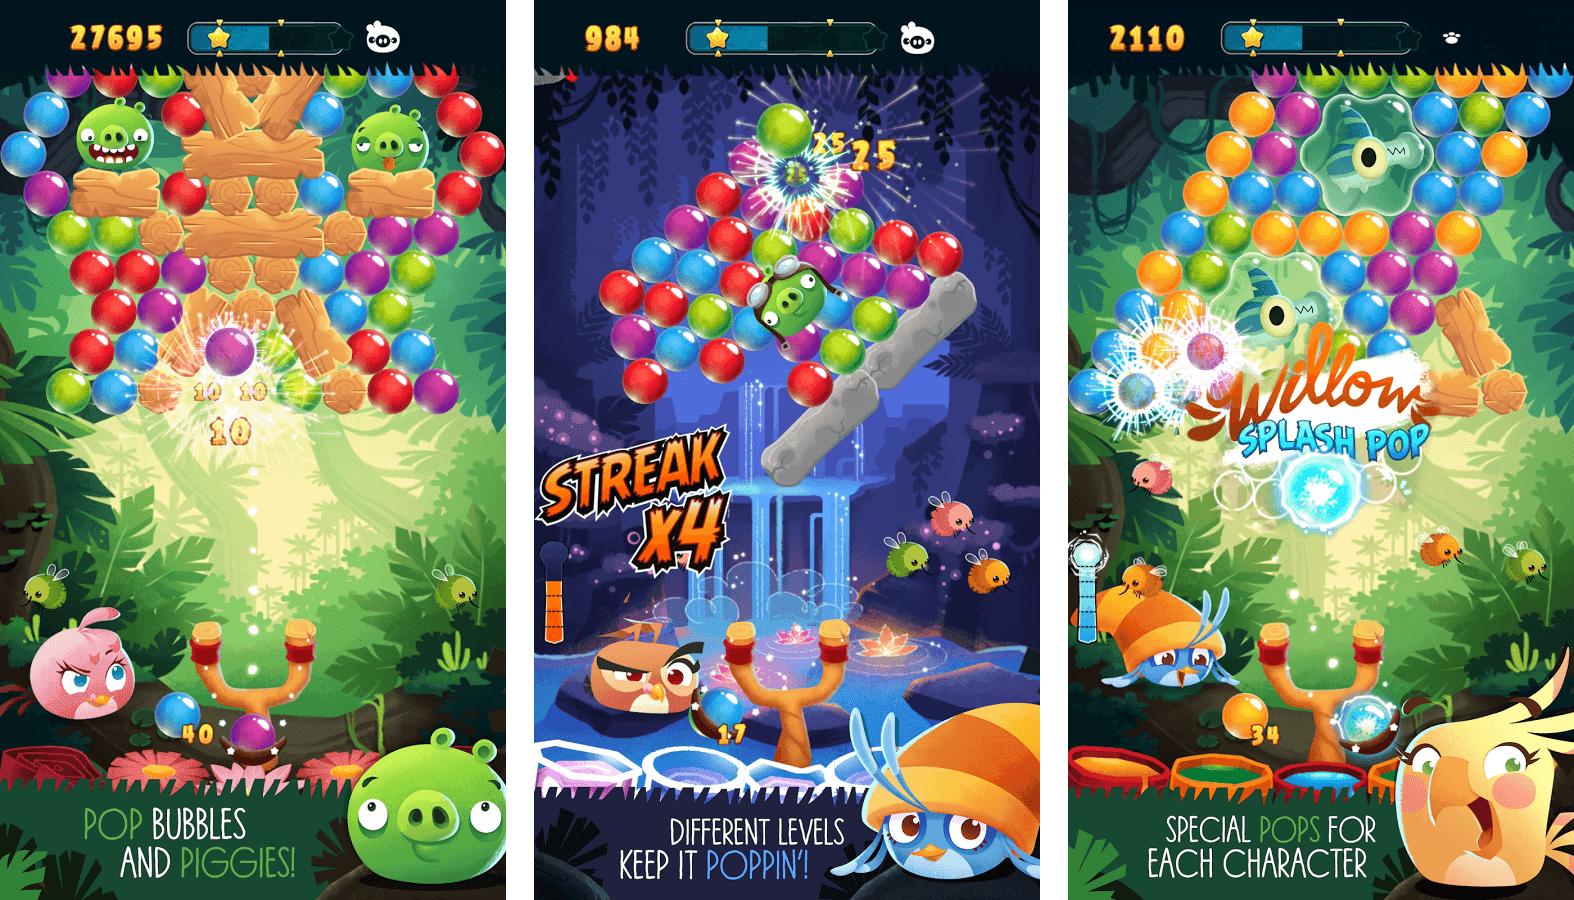 Angry Birds Stella POP! Mod Apk